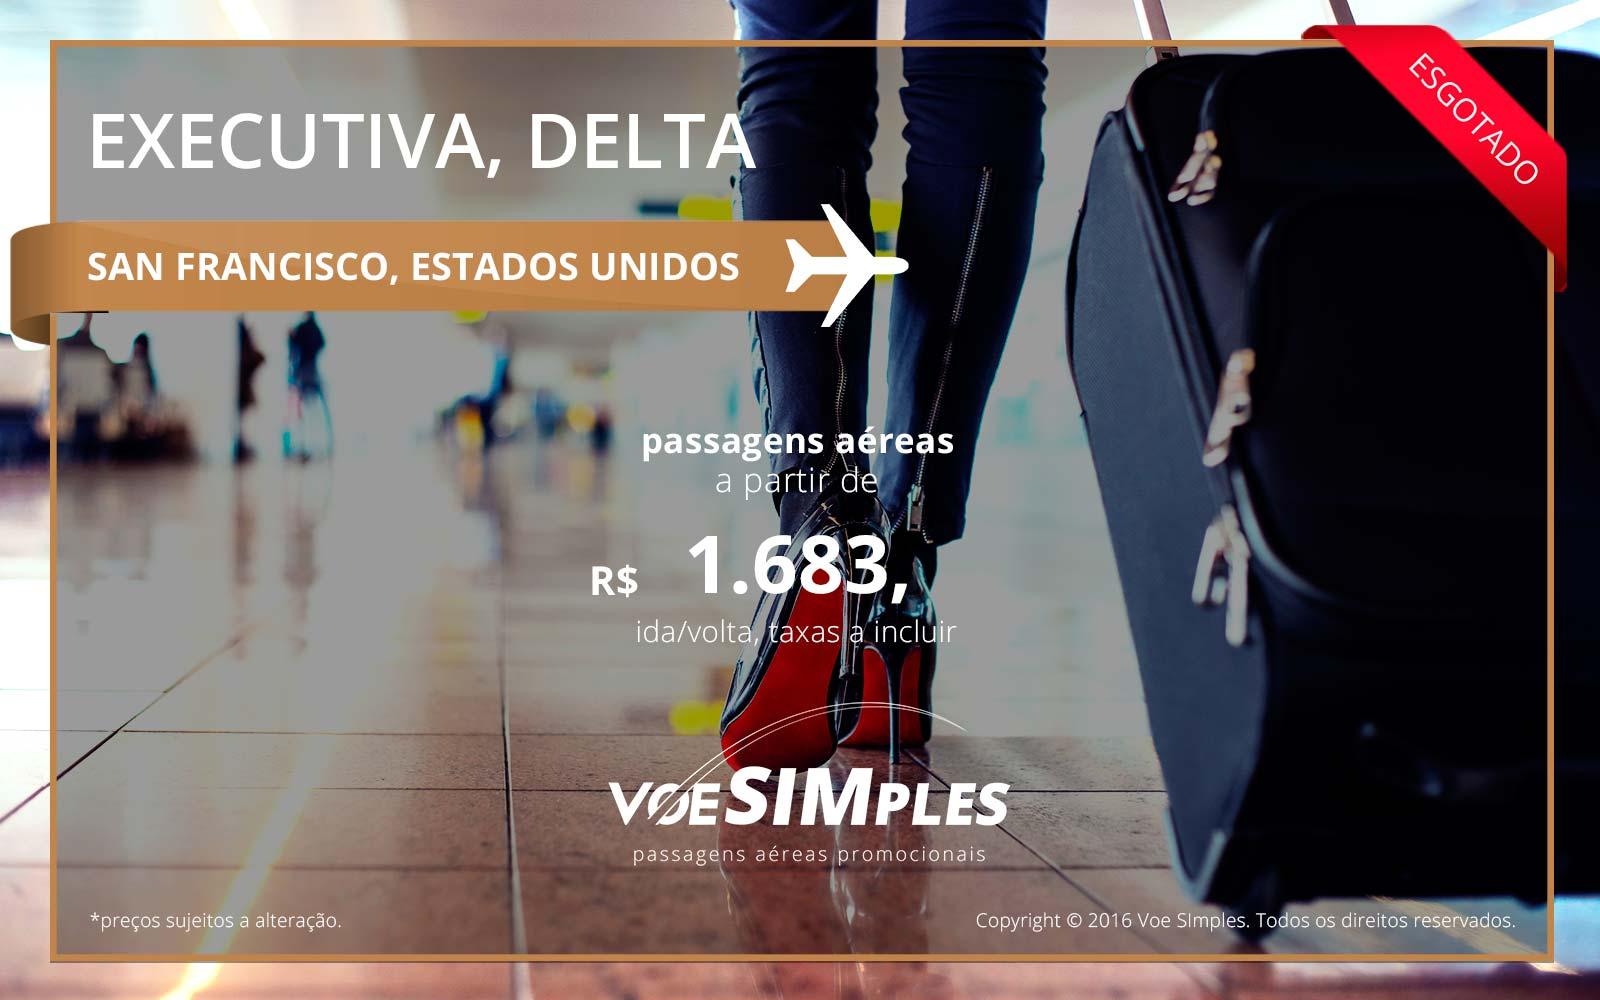 Passagem aérea Classe Executiva Delta Airlines para San Francisco